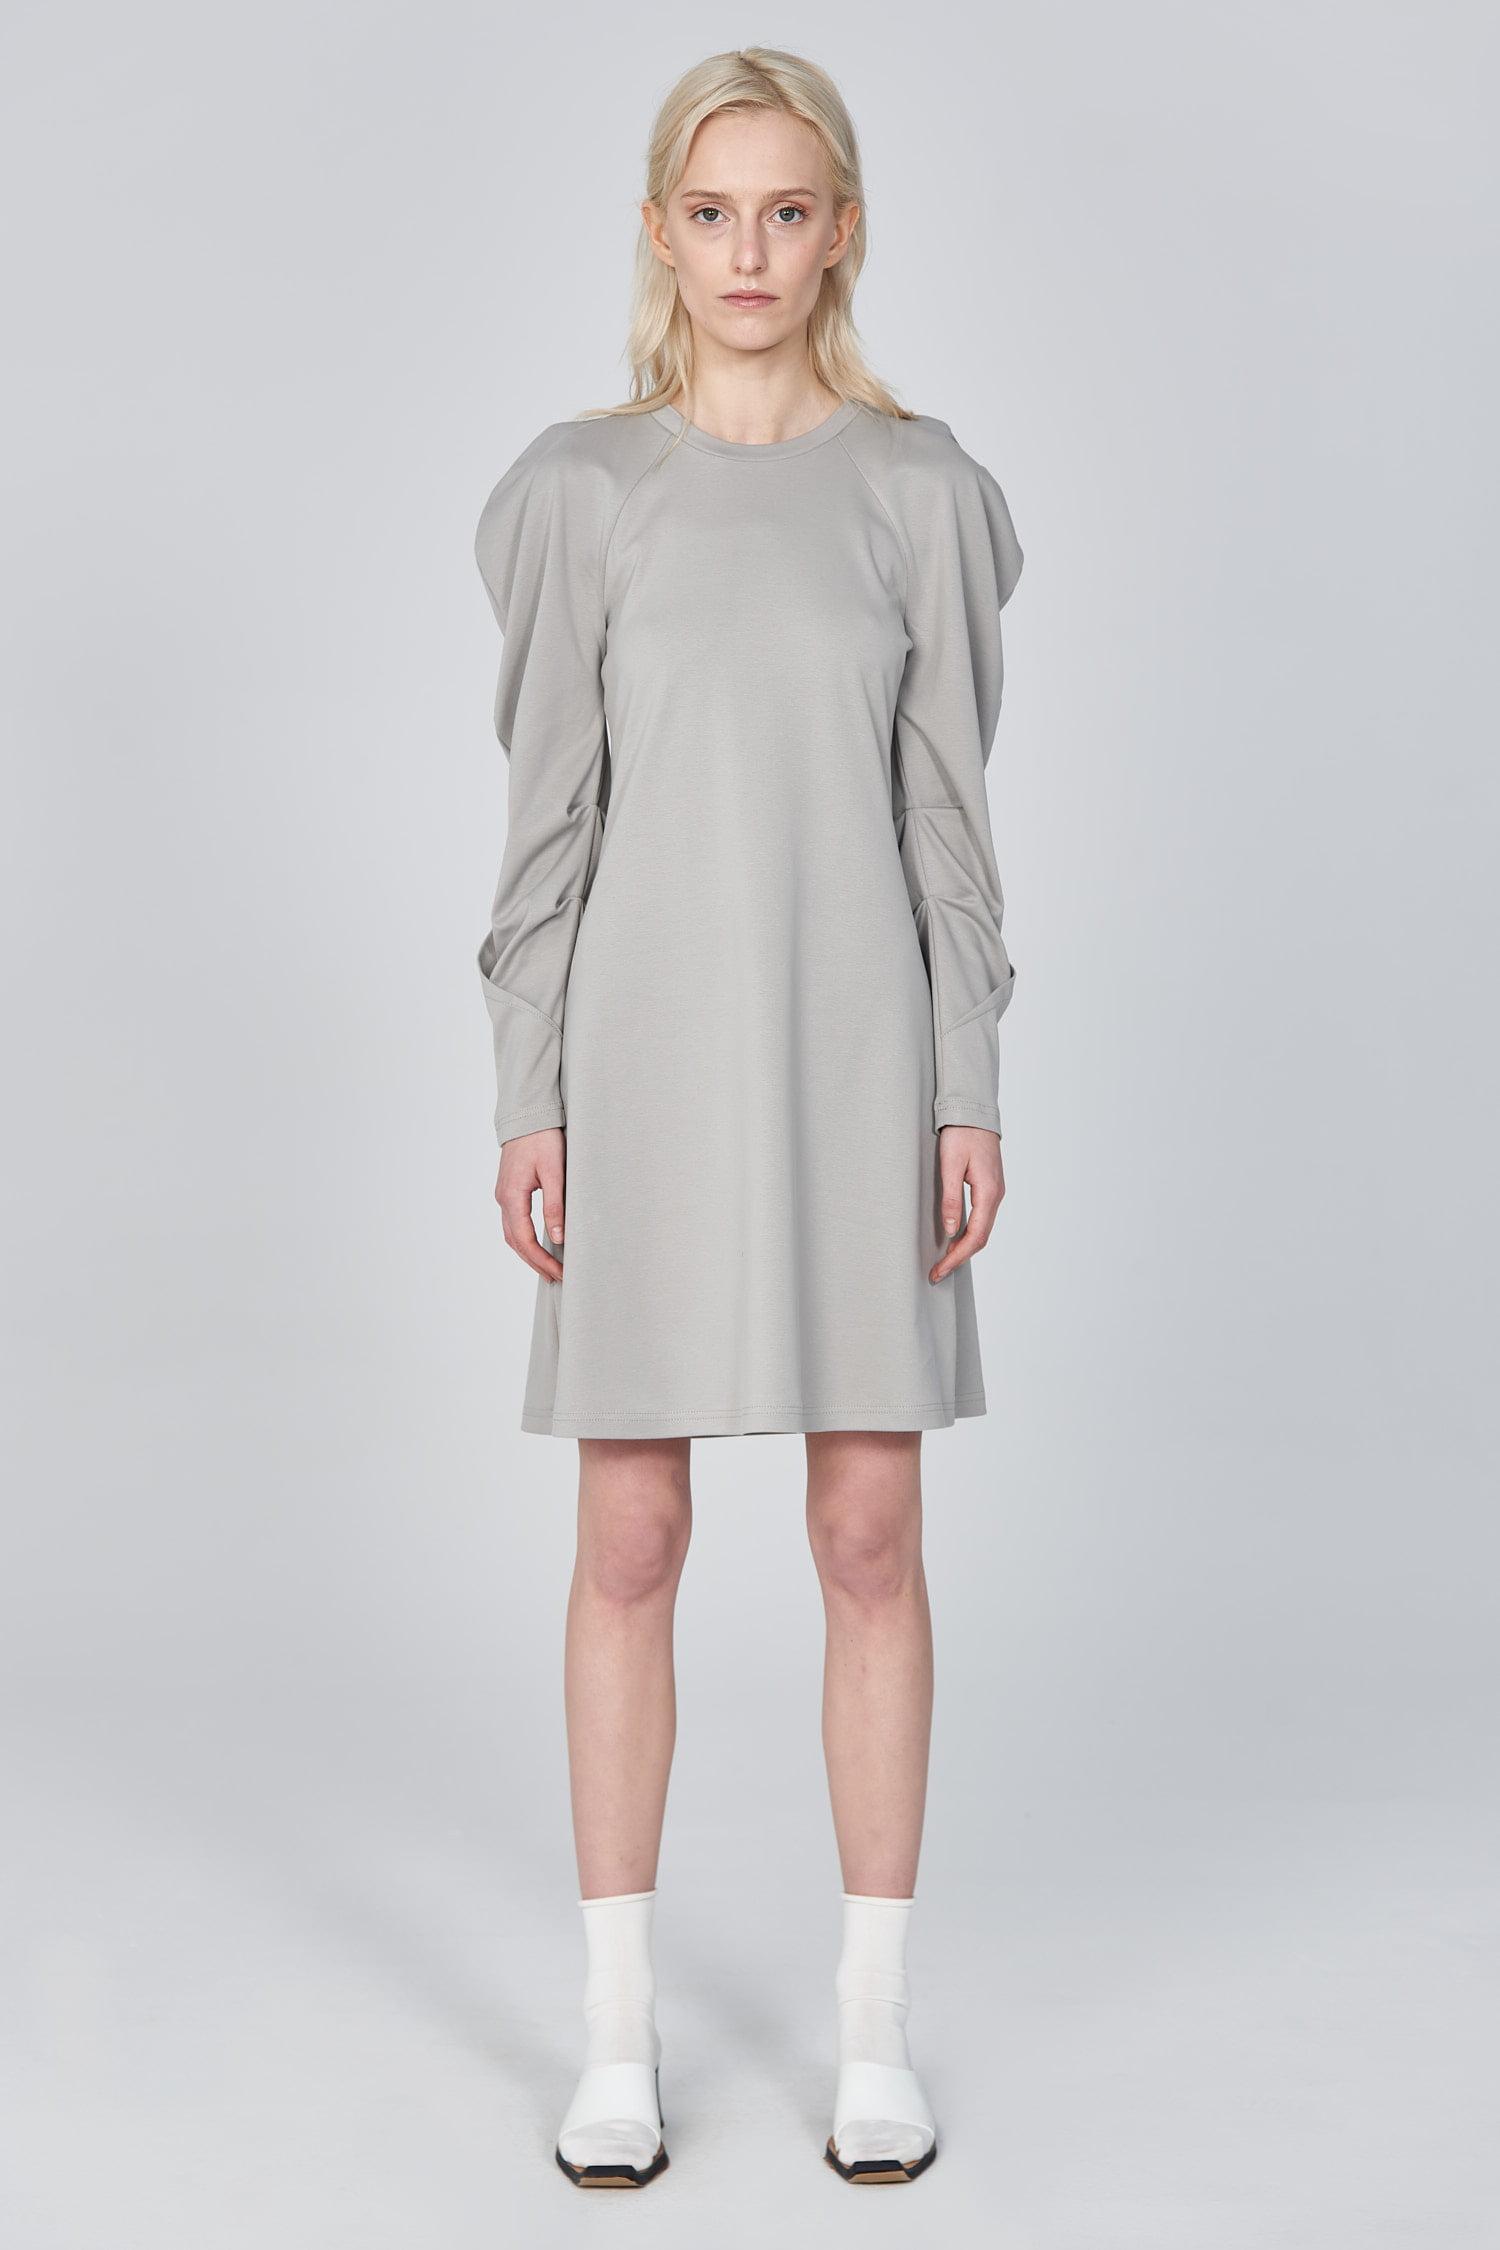 Acephala Ss21 Mini Dress With Draped Sleeves Front